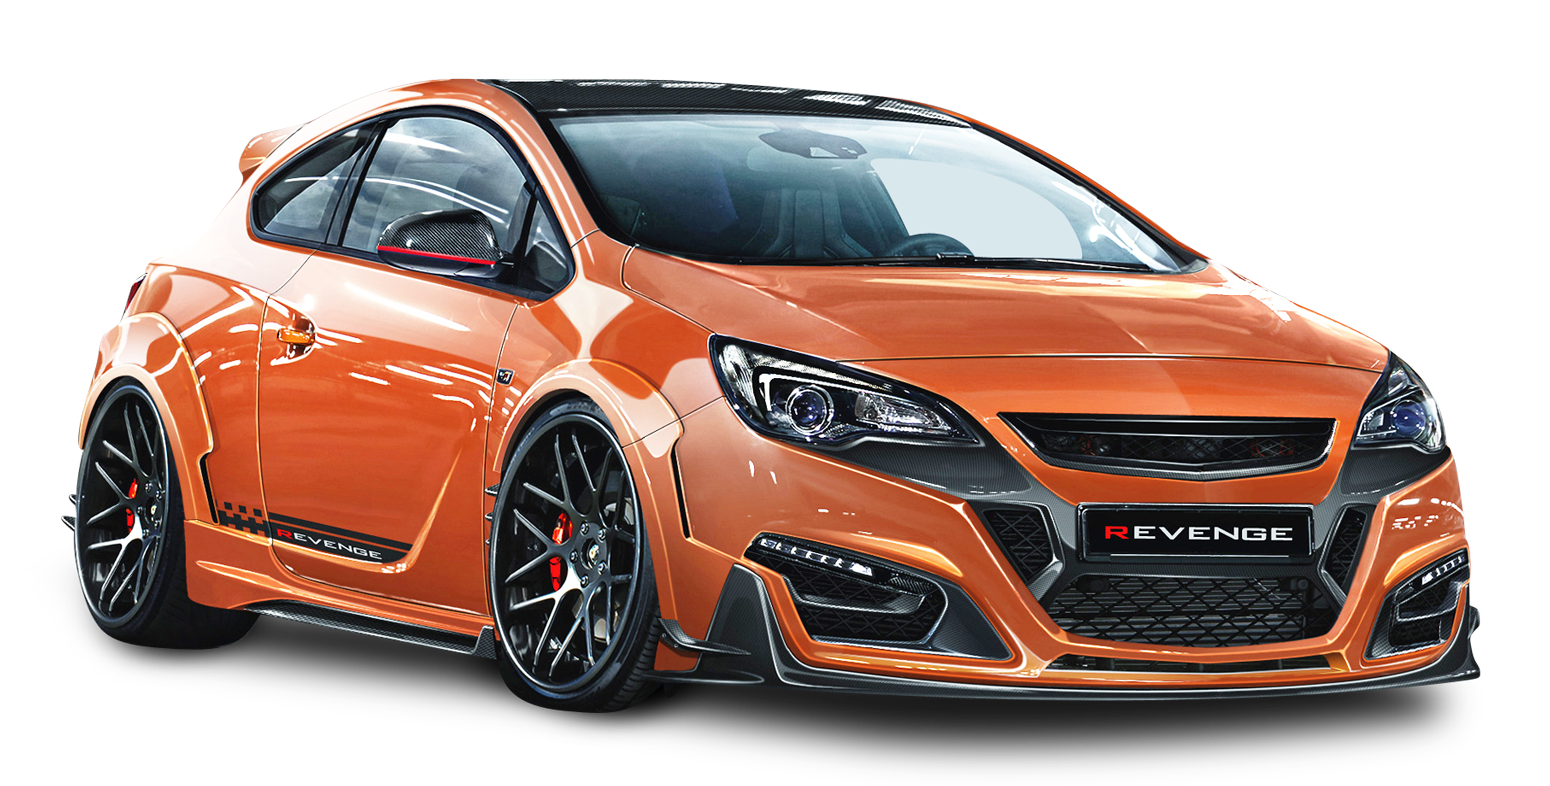 Opel Astra Vauxhall Motors Opel Gtc Vauxhall Astra Opel Astra